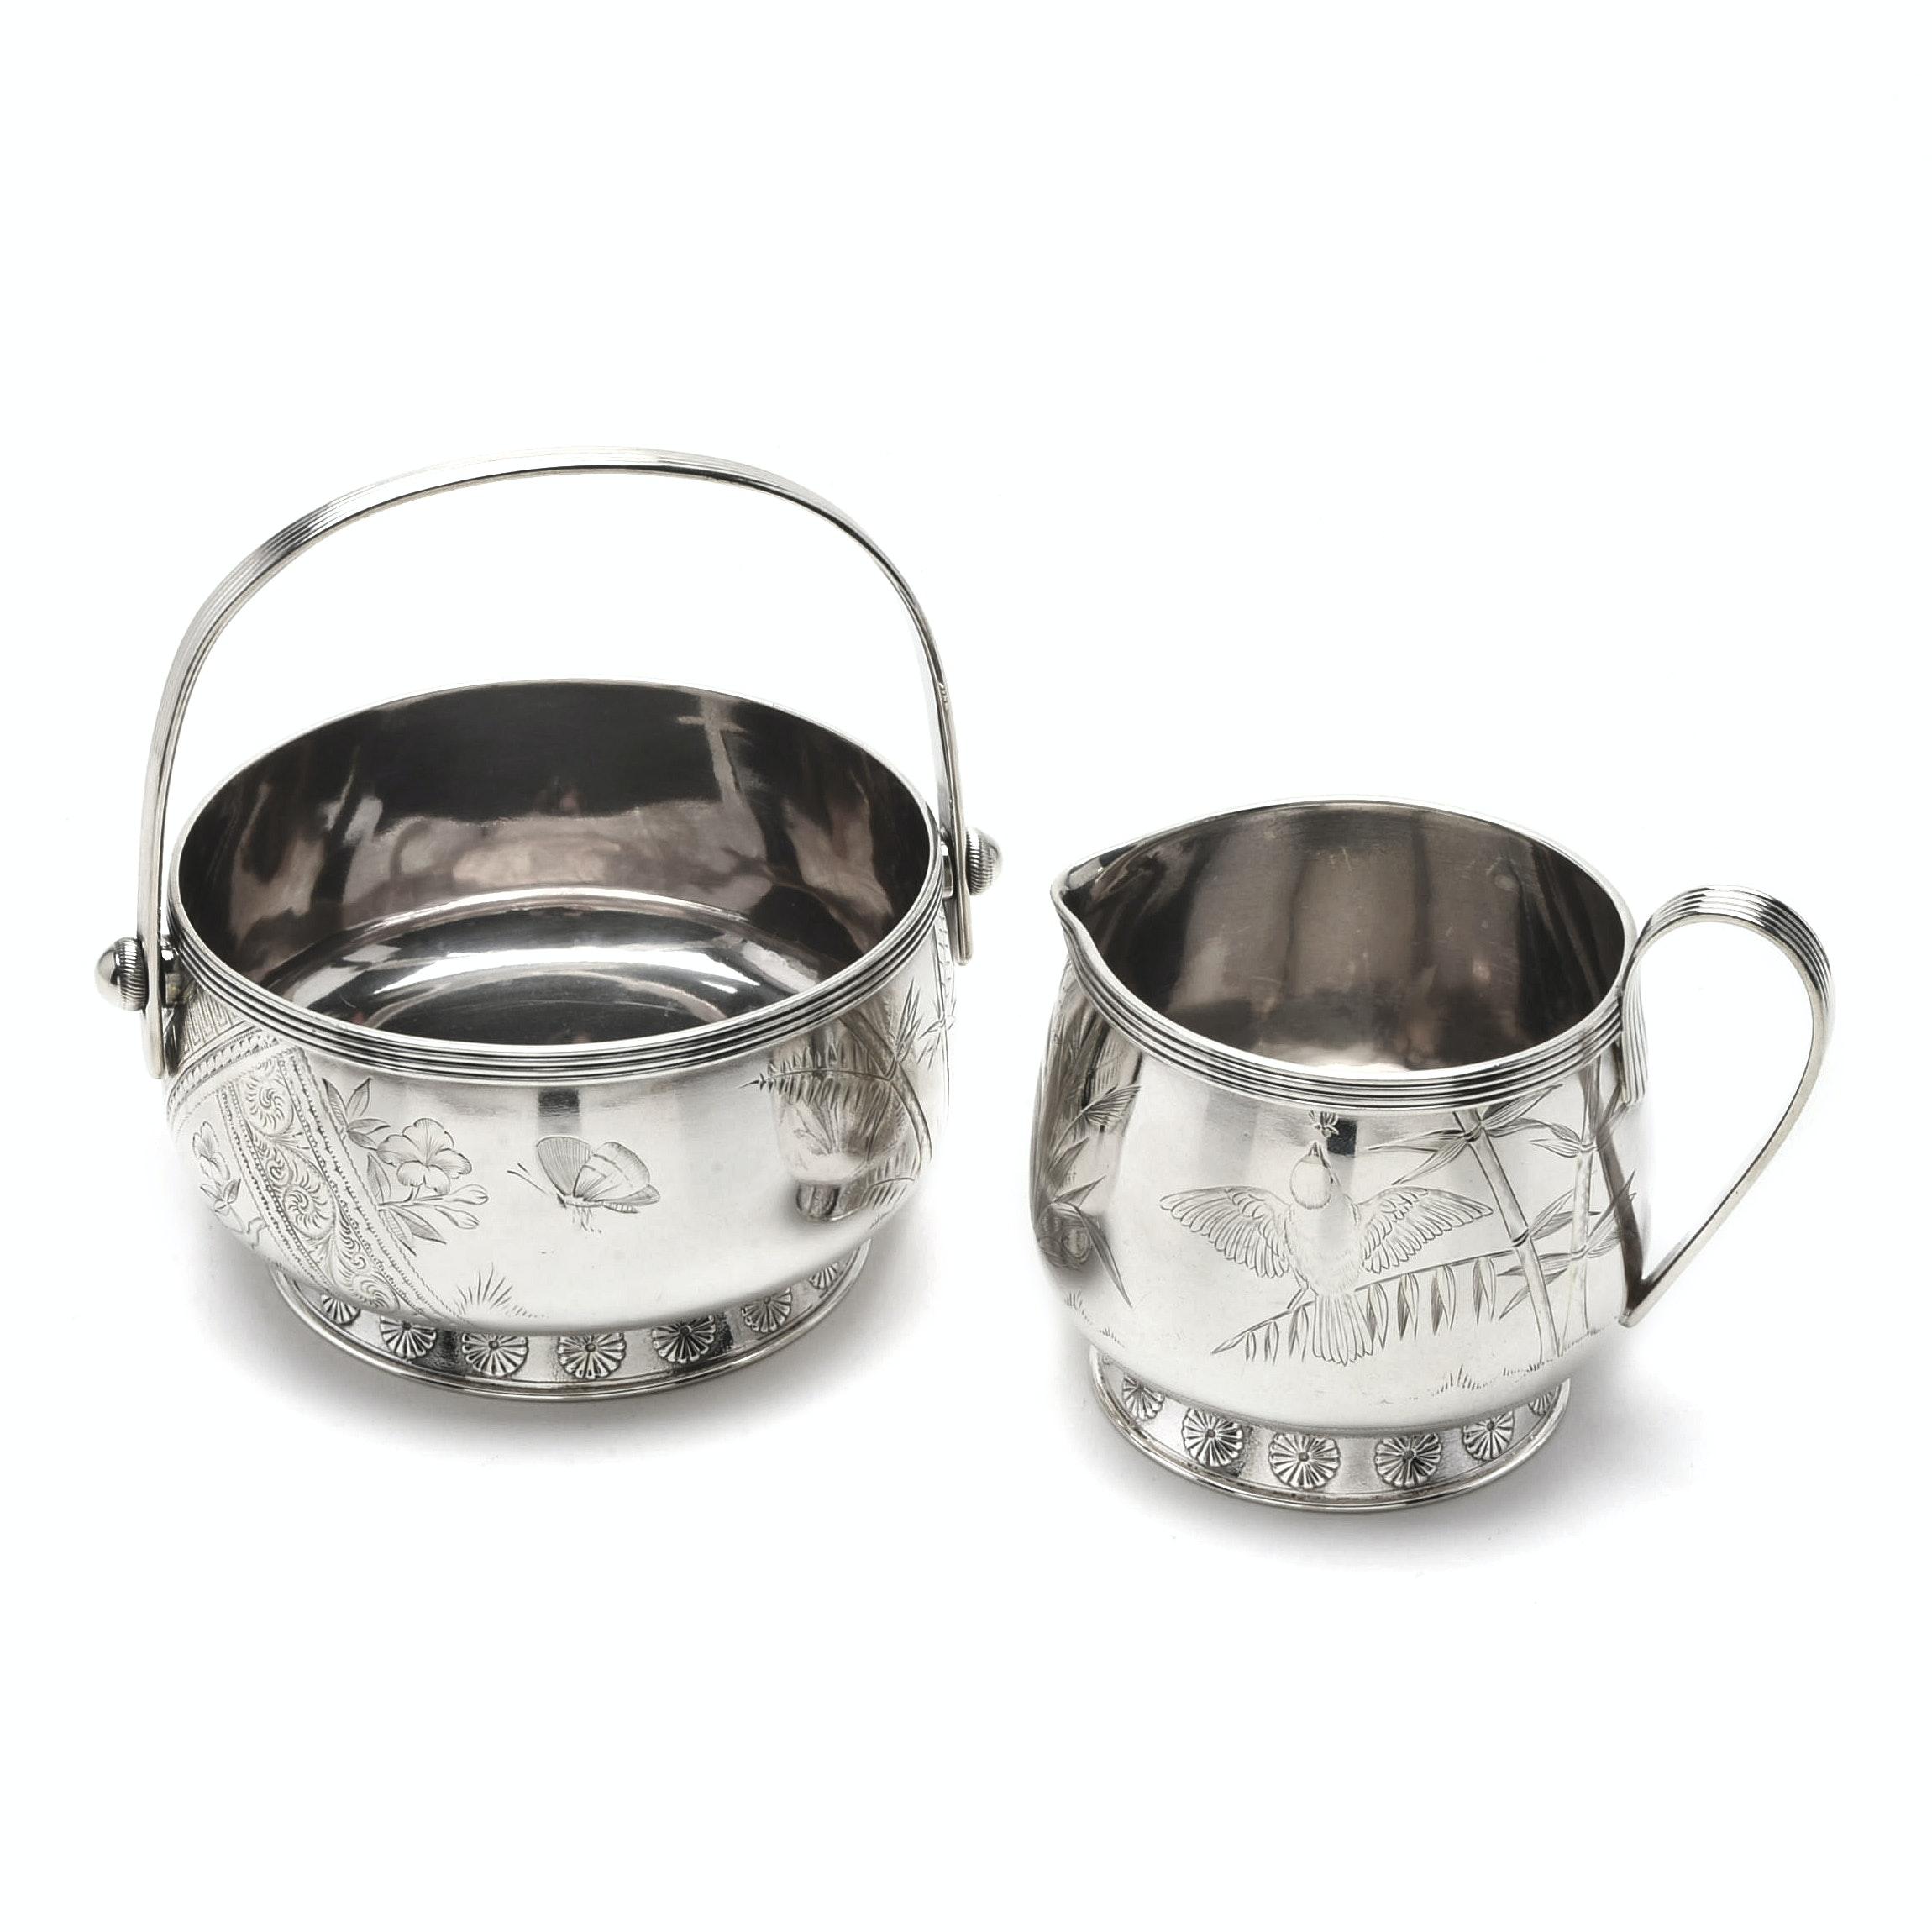 Gorham Sterling Silver Engraved Open Sugar Bowl and Creamer